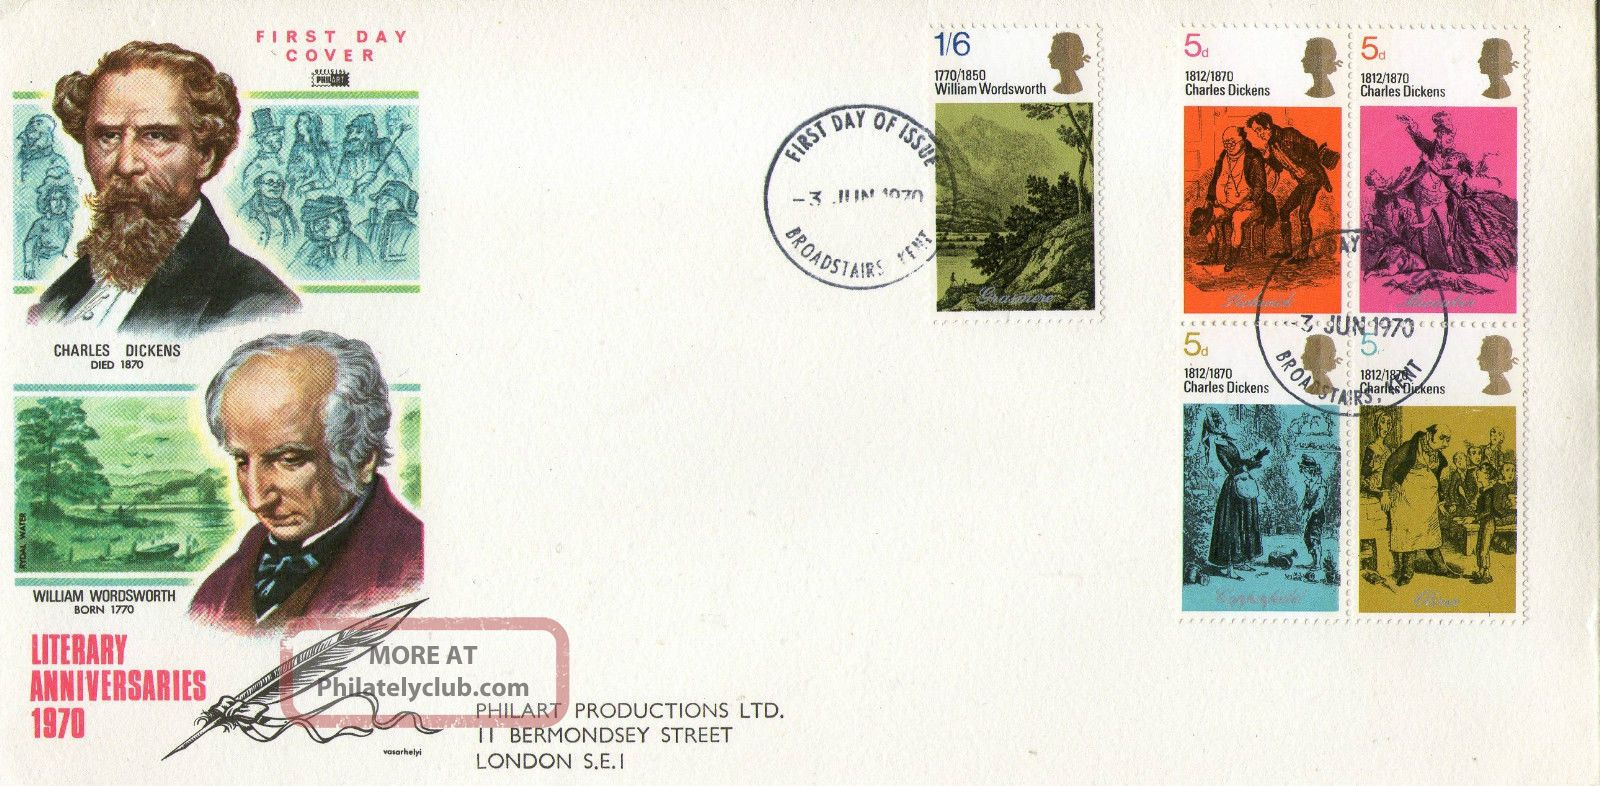 3 June 1970 Literary Anniversaries Philart Fdc Very Scarce Broadstairs Fdi Topical Stamps photo